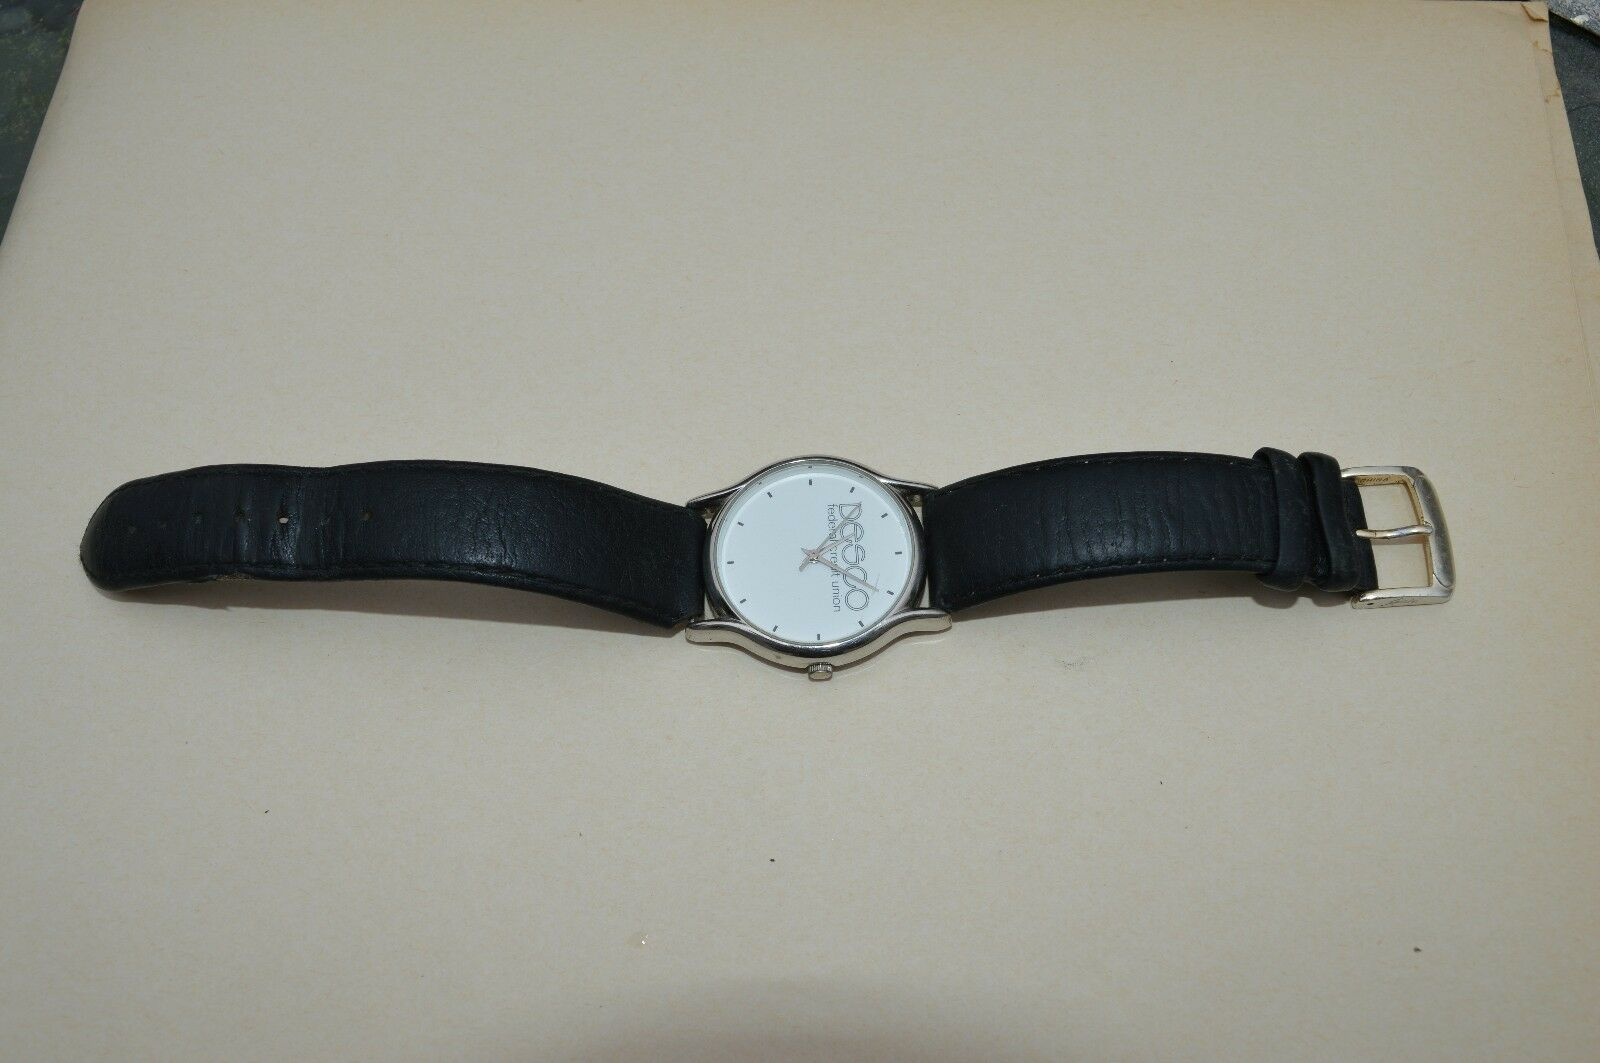 Vintage  SWEDA  ''DESCO'' Federal Credit Union'''  Nice watch, New Battery